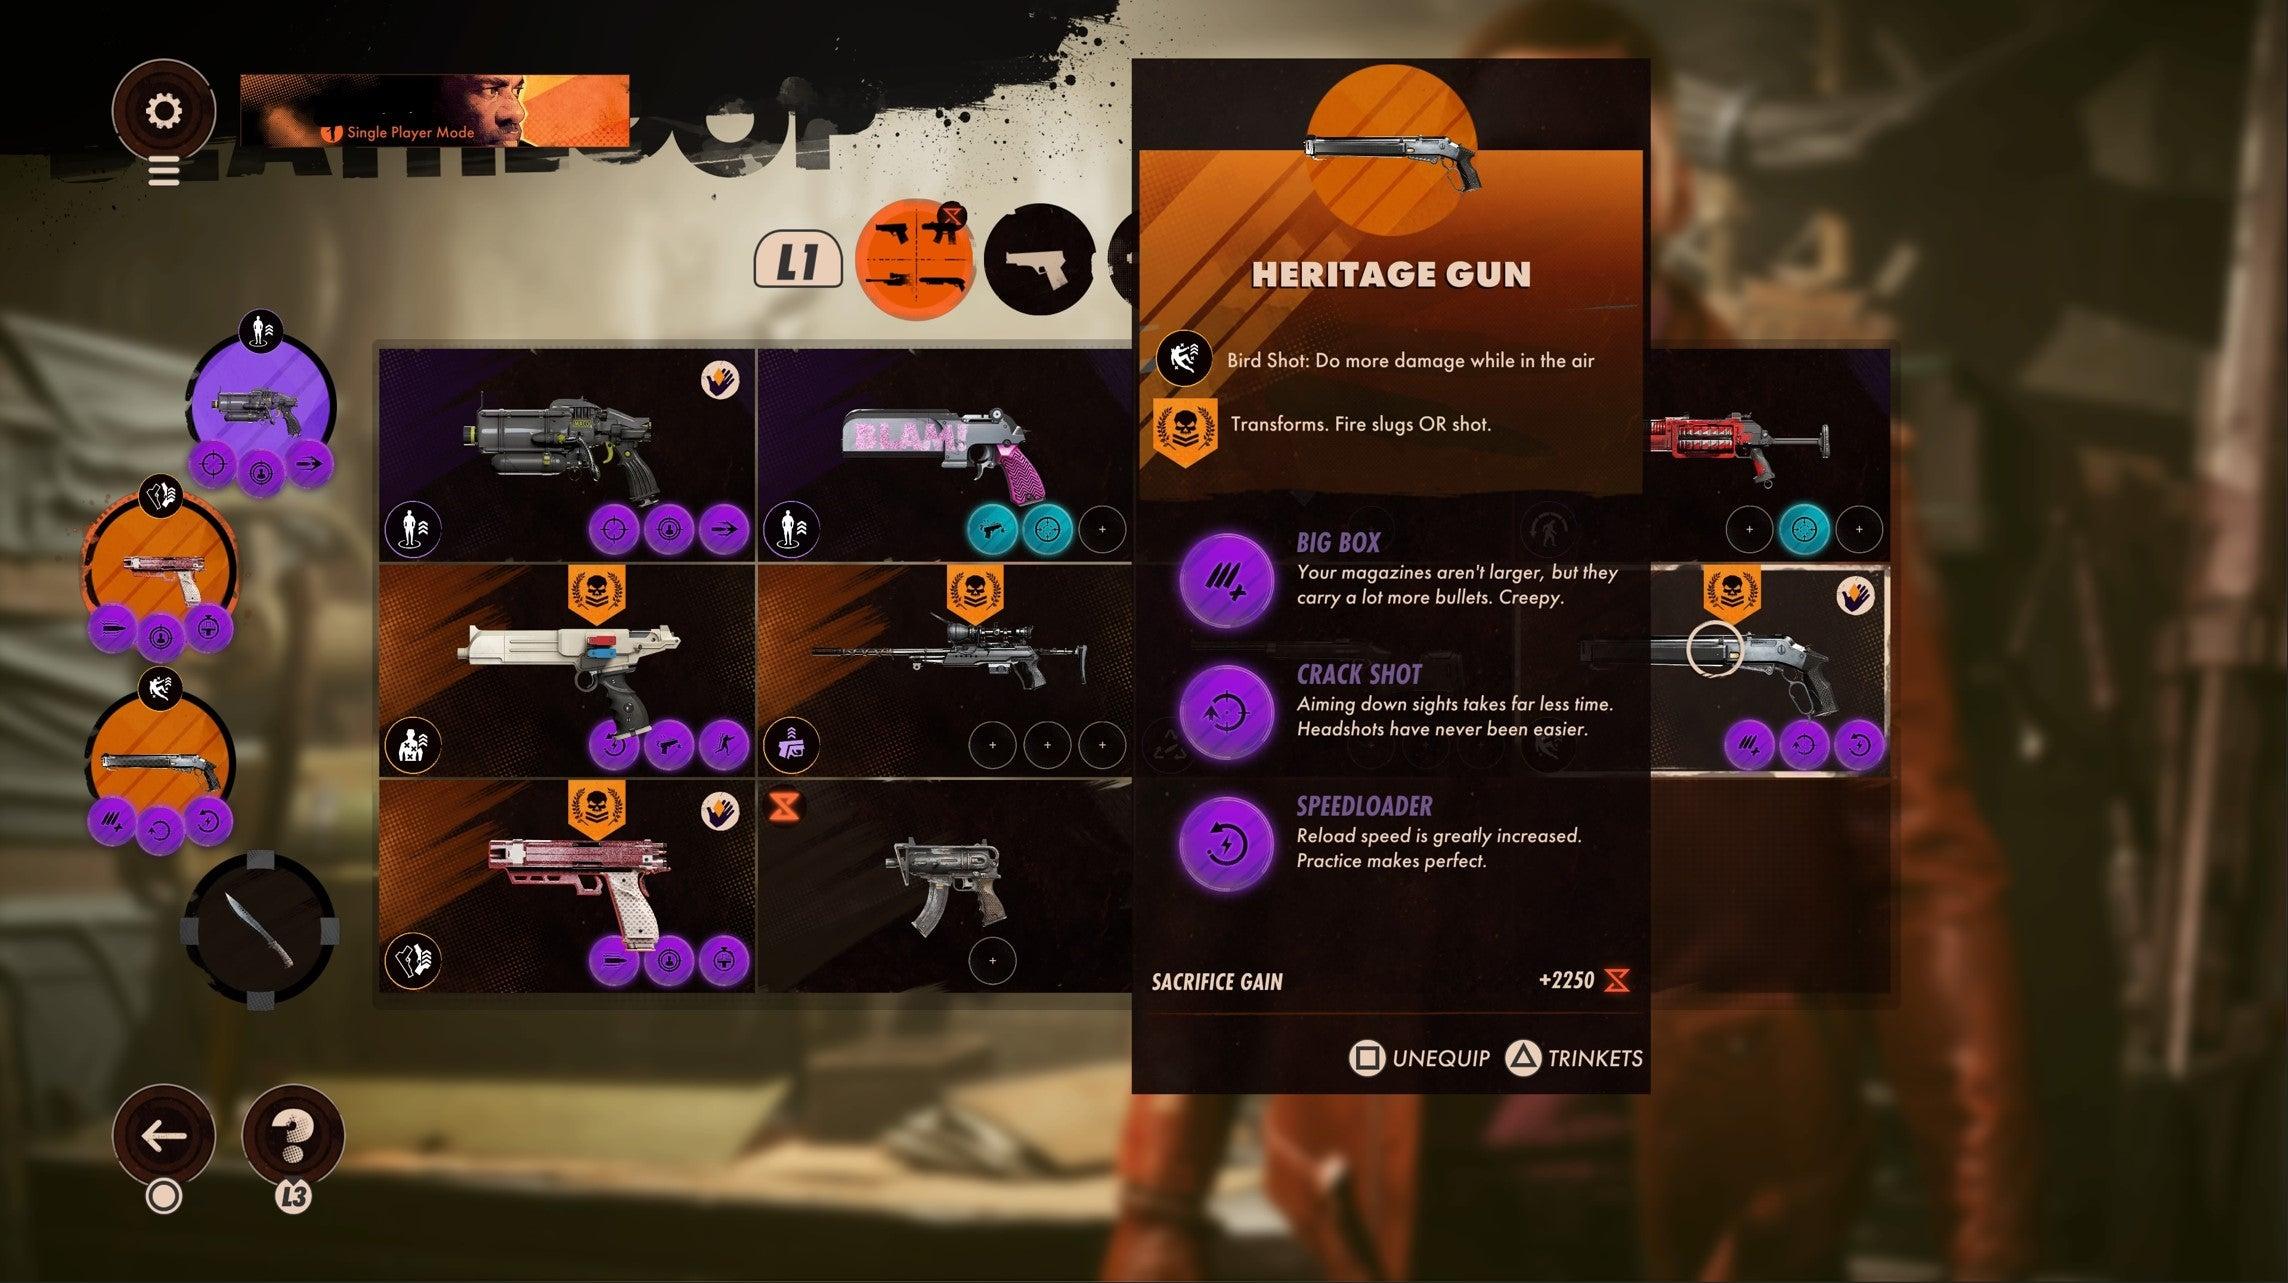 How to get the Best Legendary Weapons in Deathloop - VG247